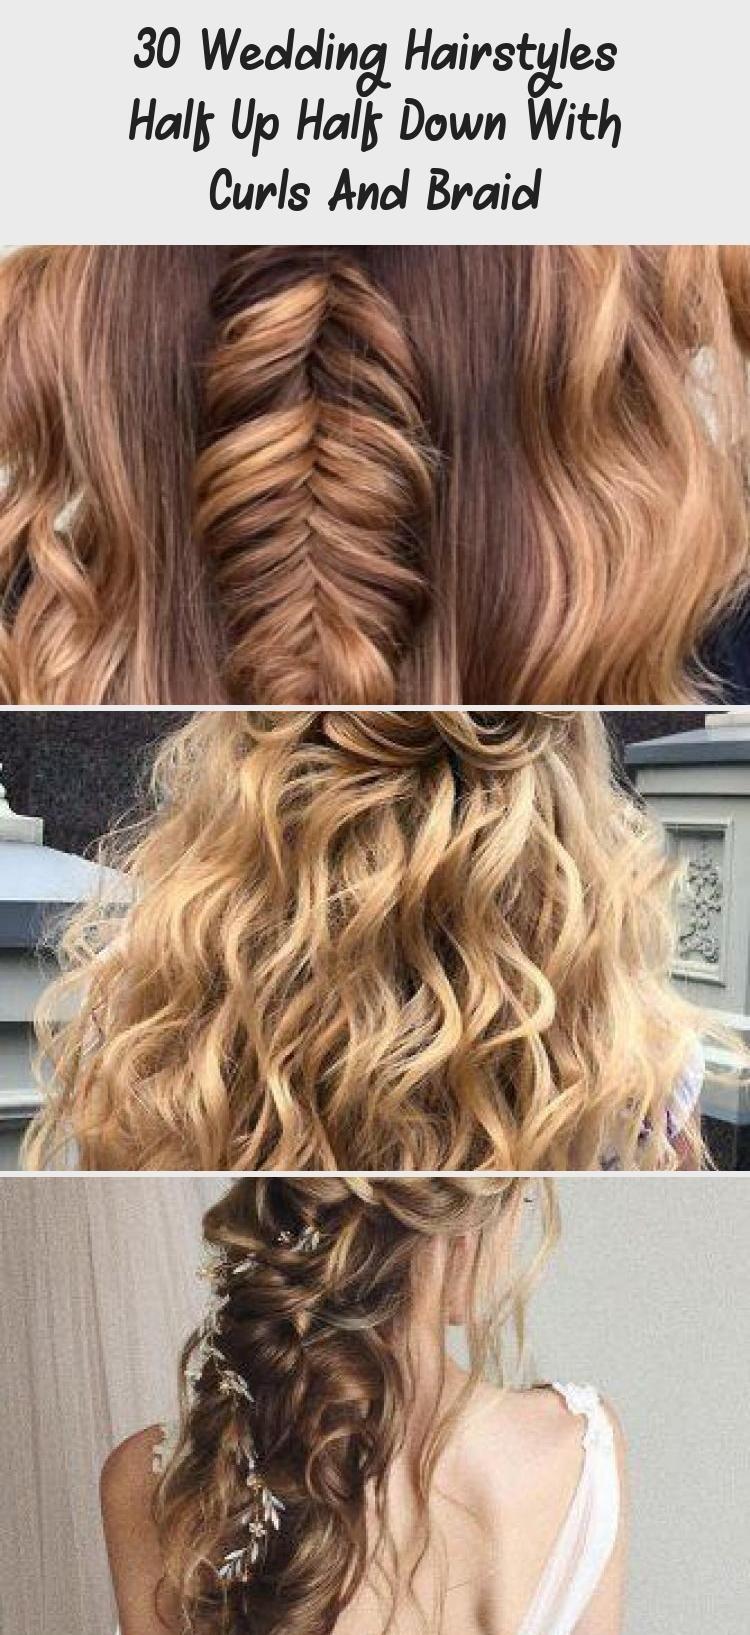 Beautiful Leichte Frisuren Fur Lange Haare Einfacheretrofrisuren Einfachevintagefrisuren Leichtefrisurendu In 2020 Flechtfrisuren Geflochtene Frisuren Haar Styling